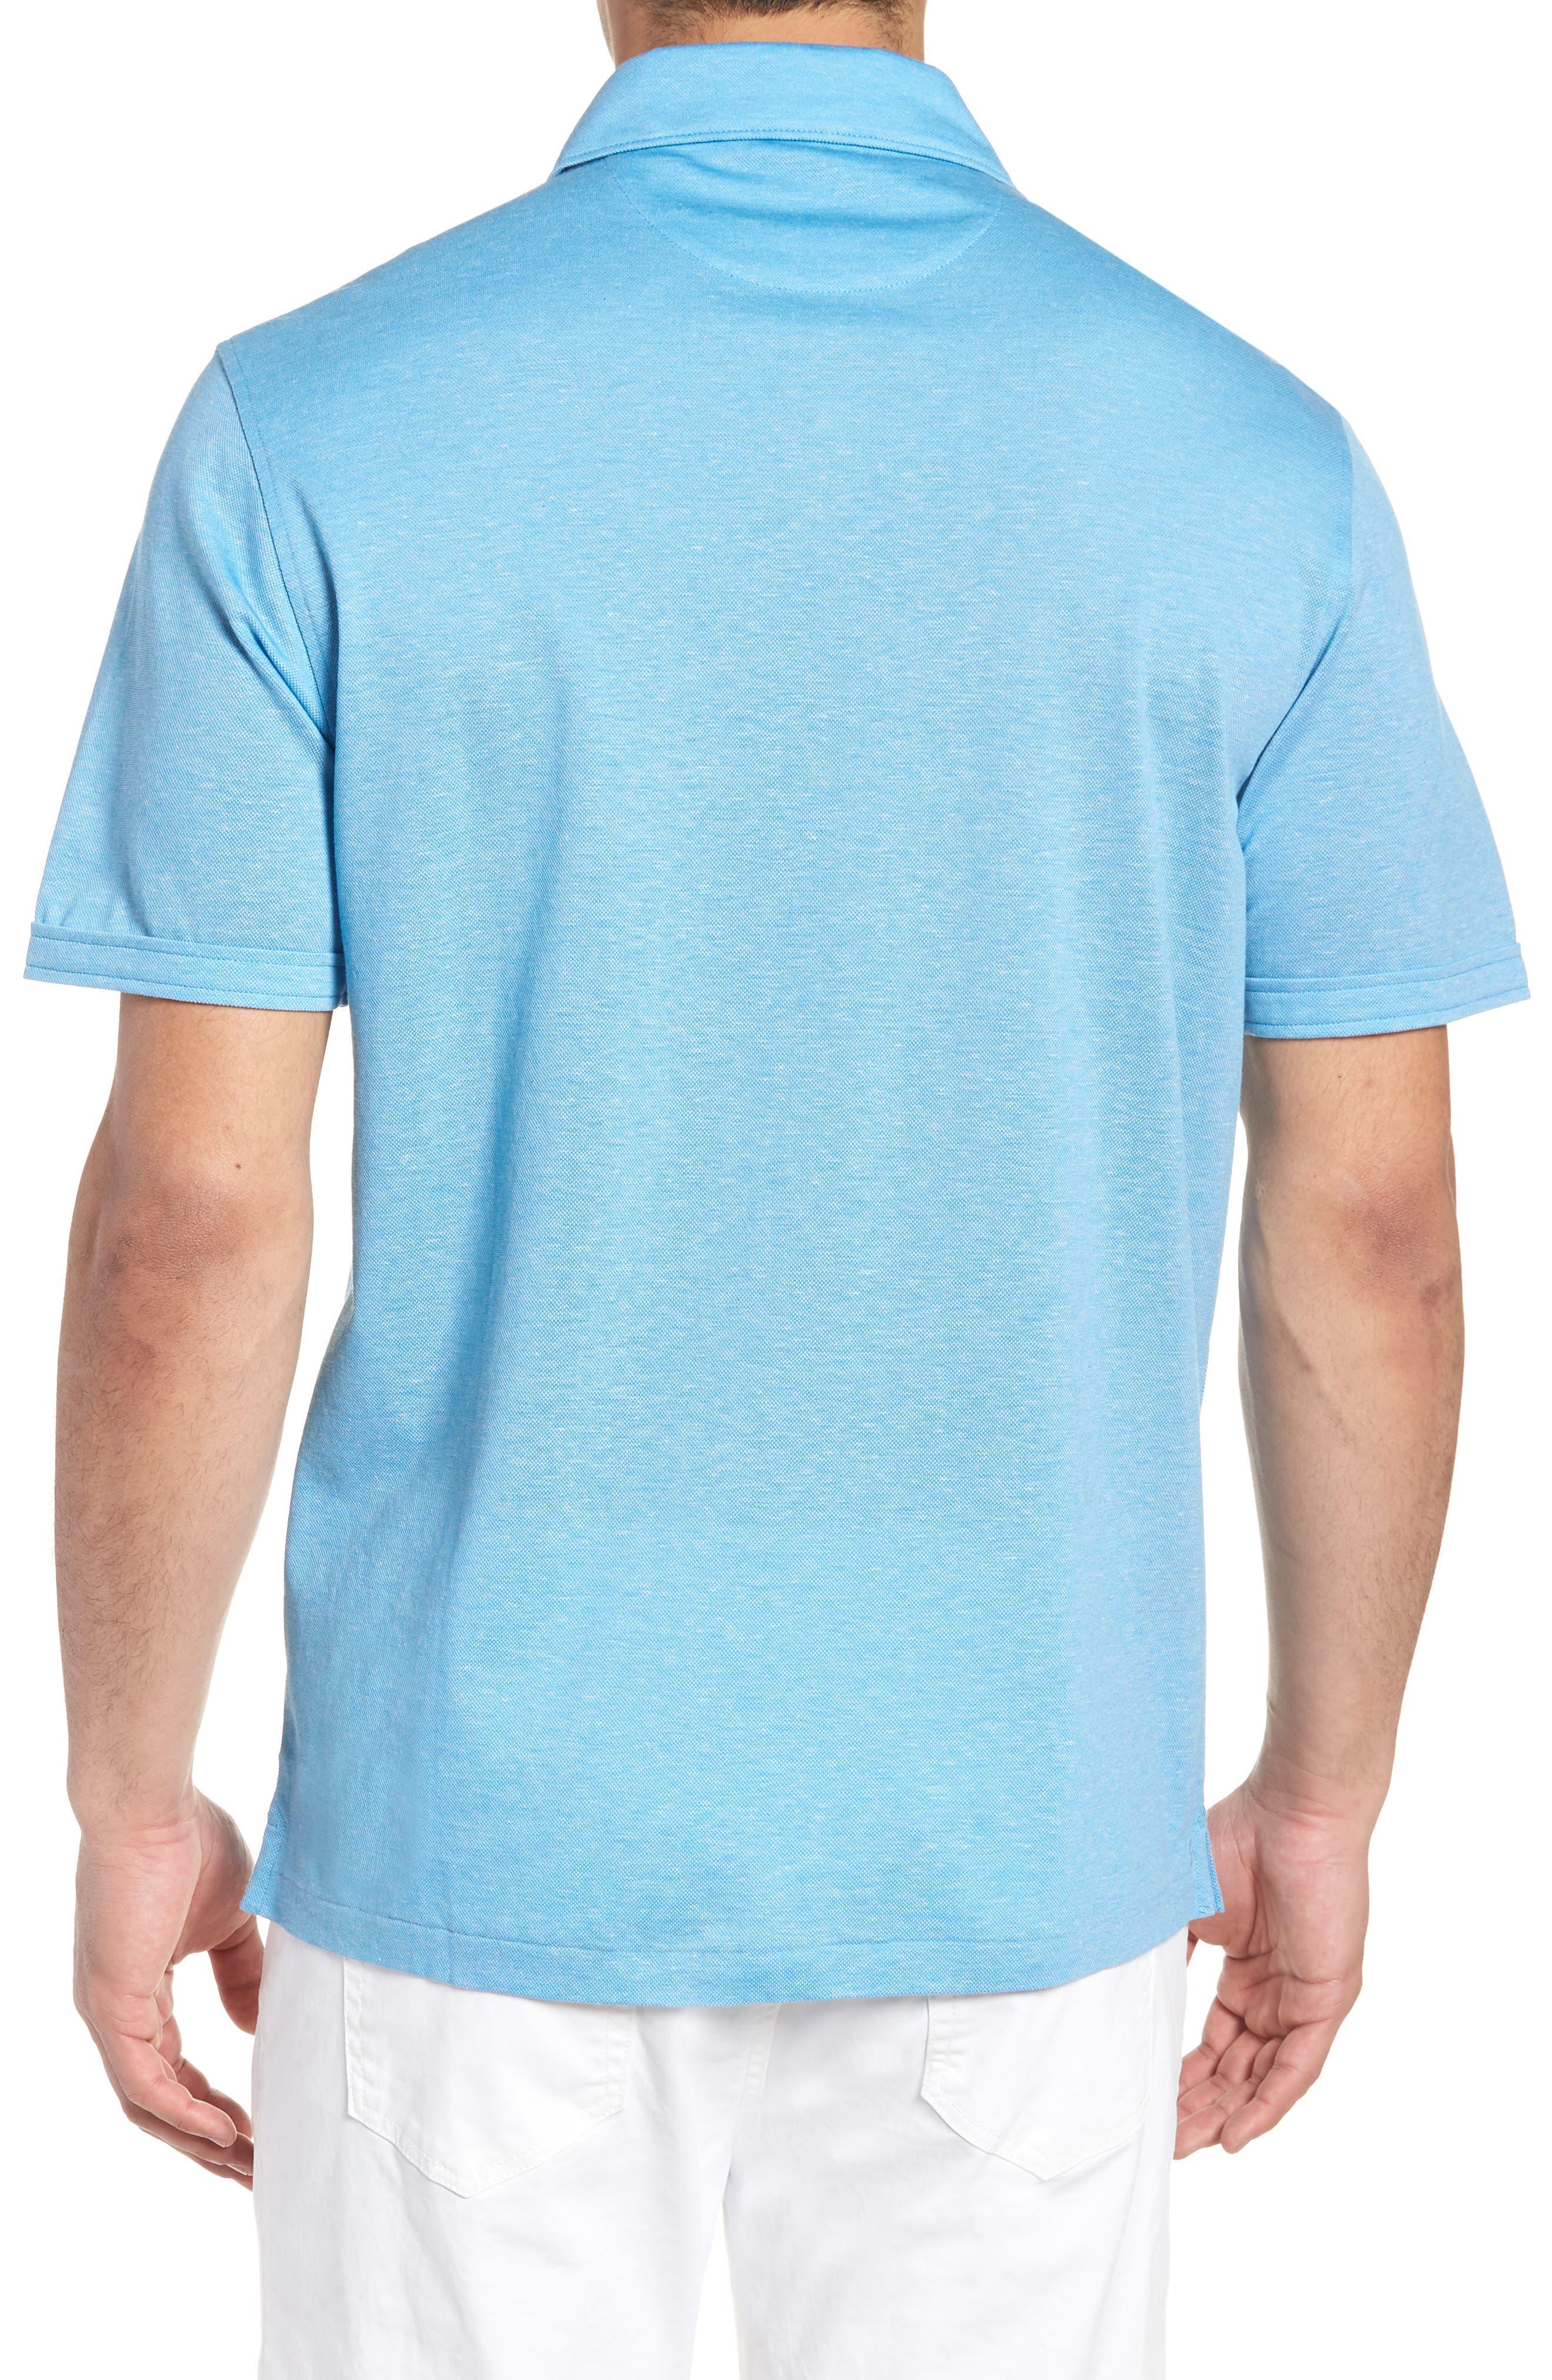 Regular Fit Heather Knit Sport Shirt,                             Alternate thumbnail 2, color,                             AIR BLUE